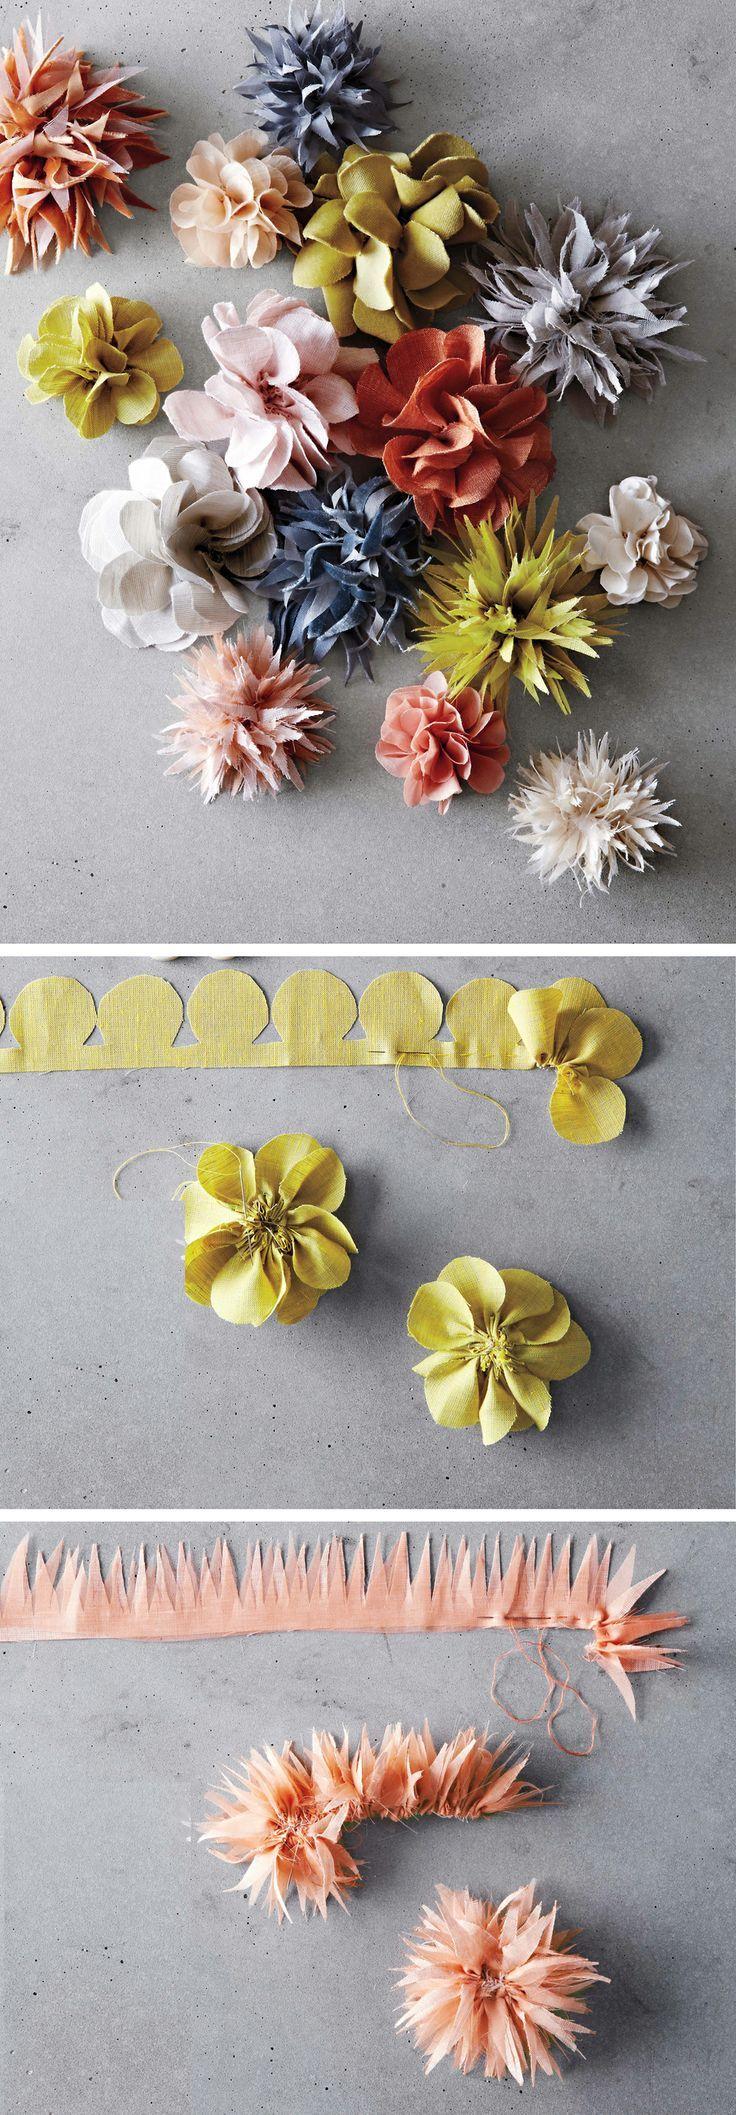 DIY Fabric Flowers.